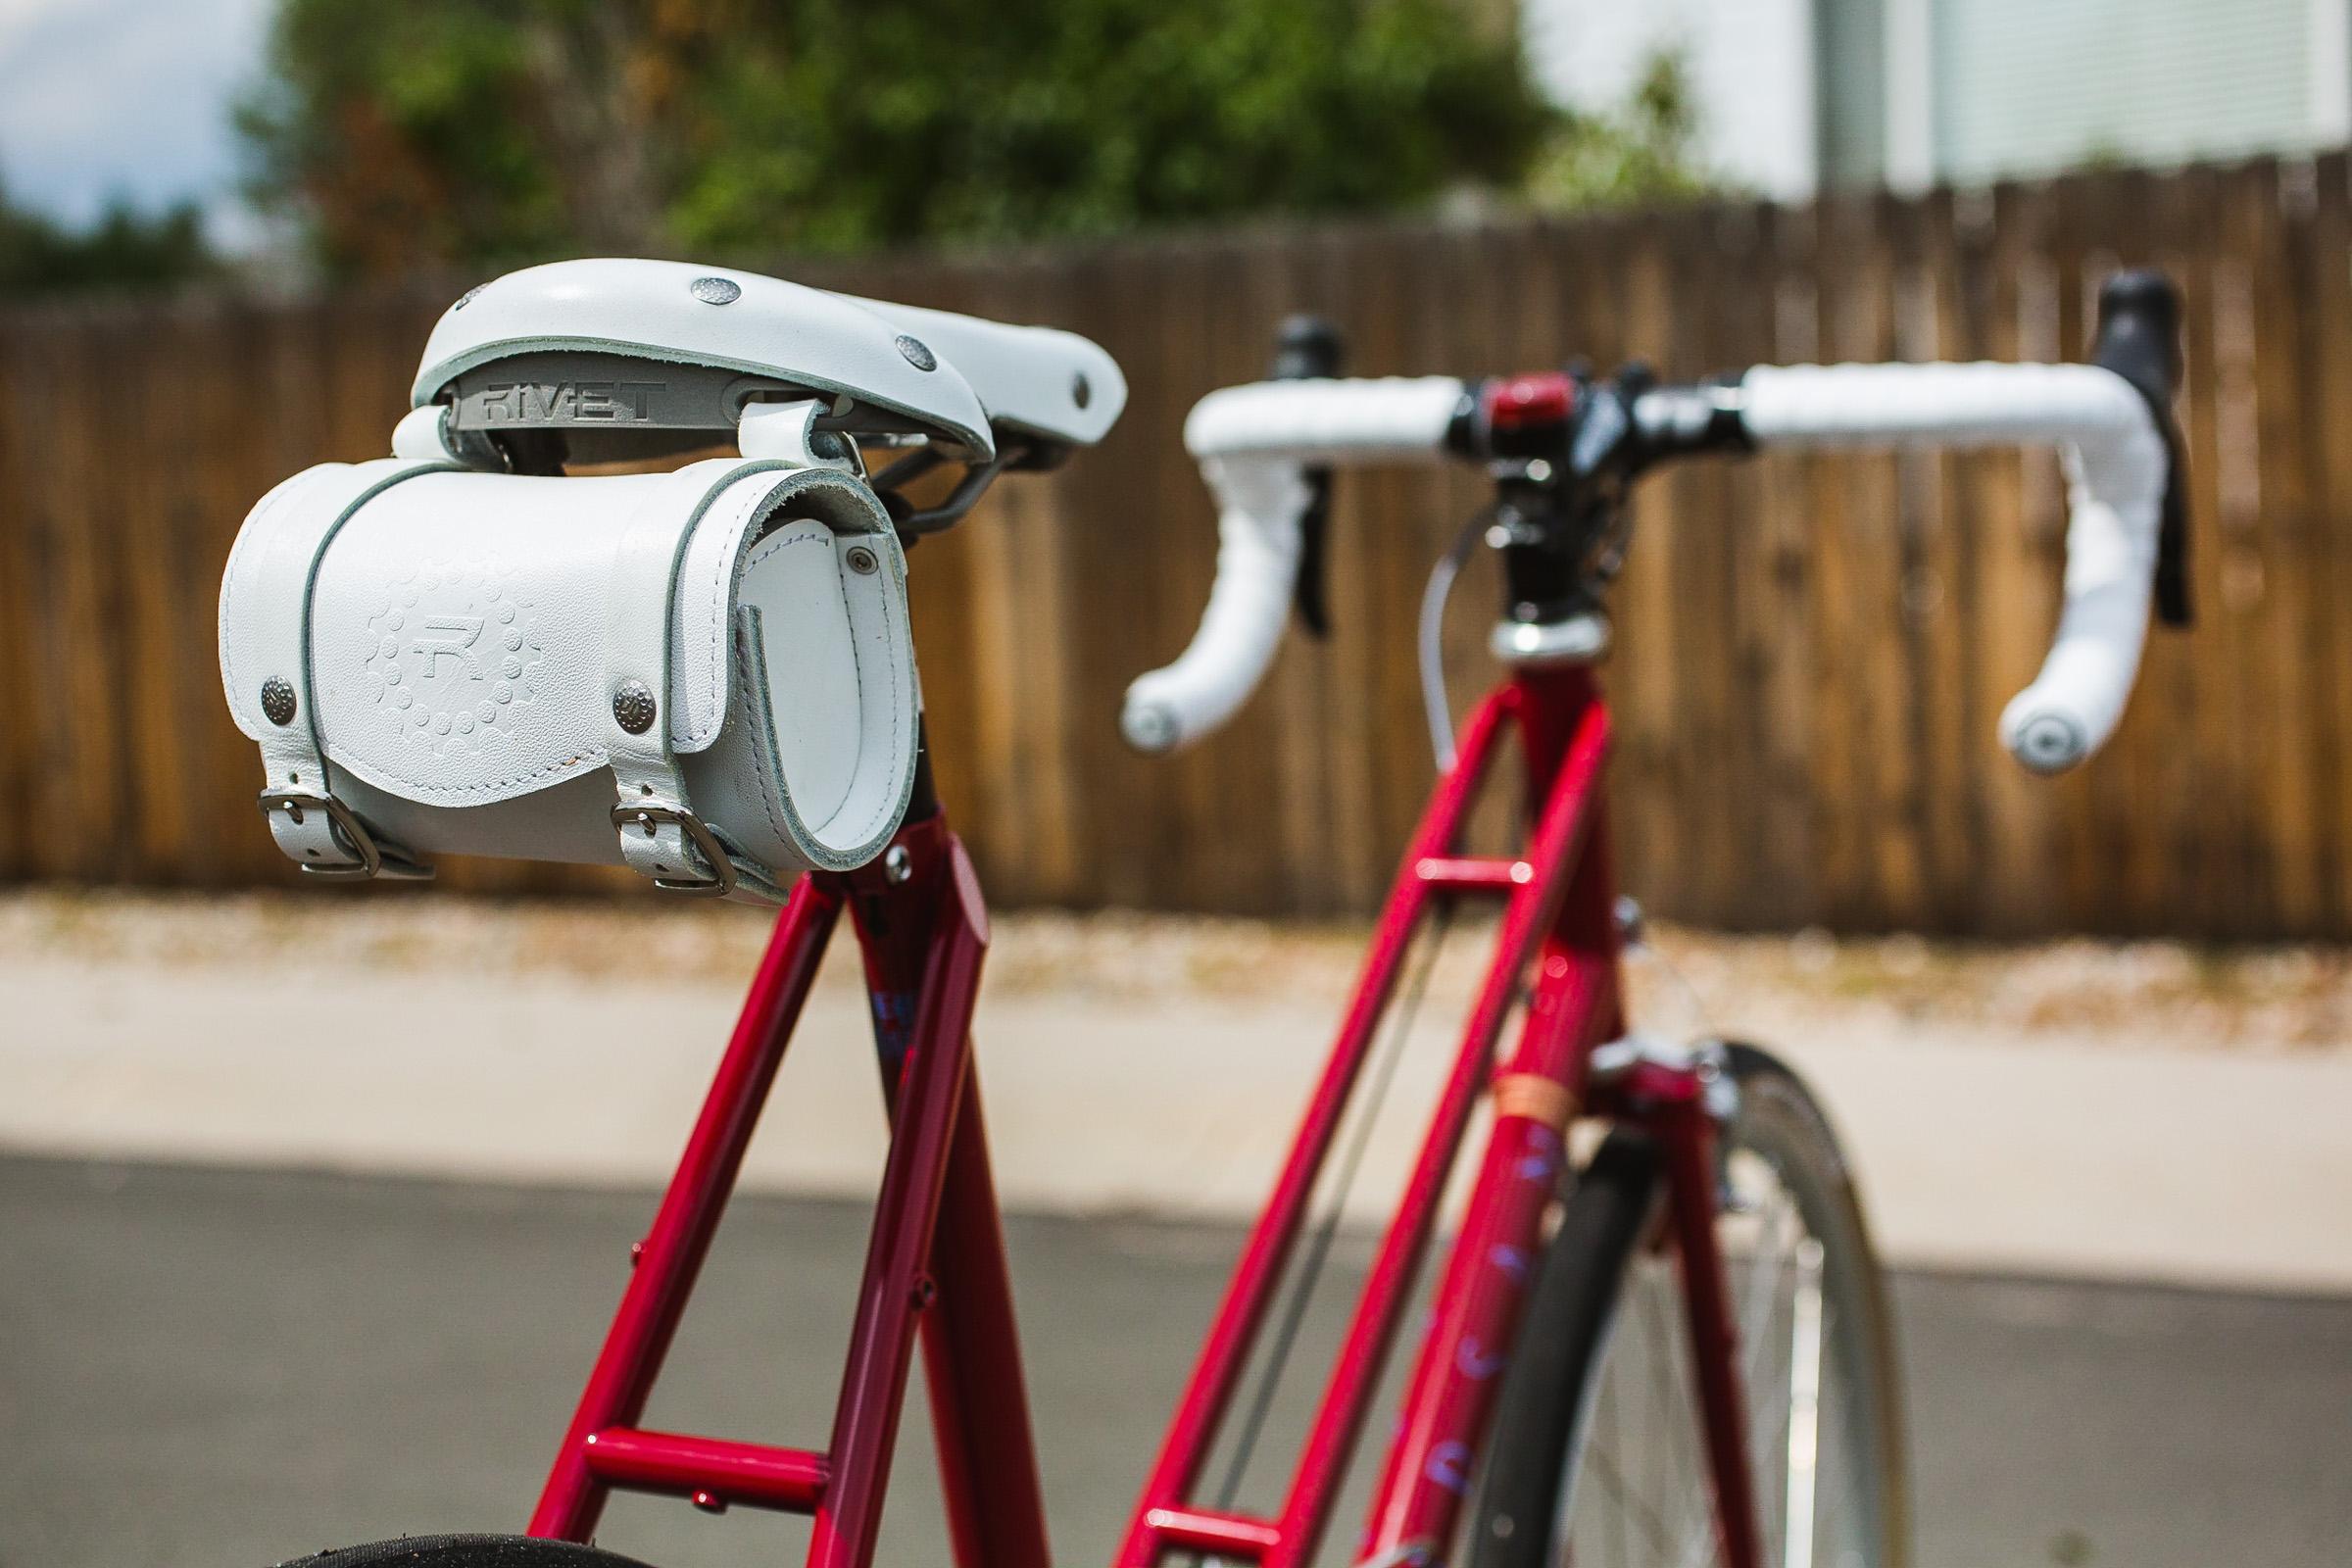 063.yipsan-bicycles-creators-series.traverse.jpg